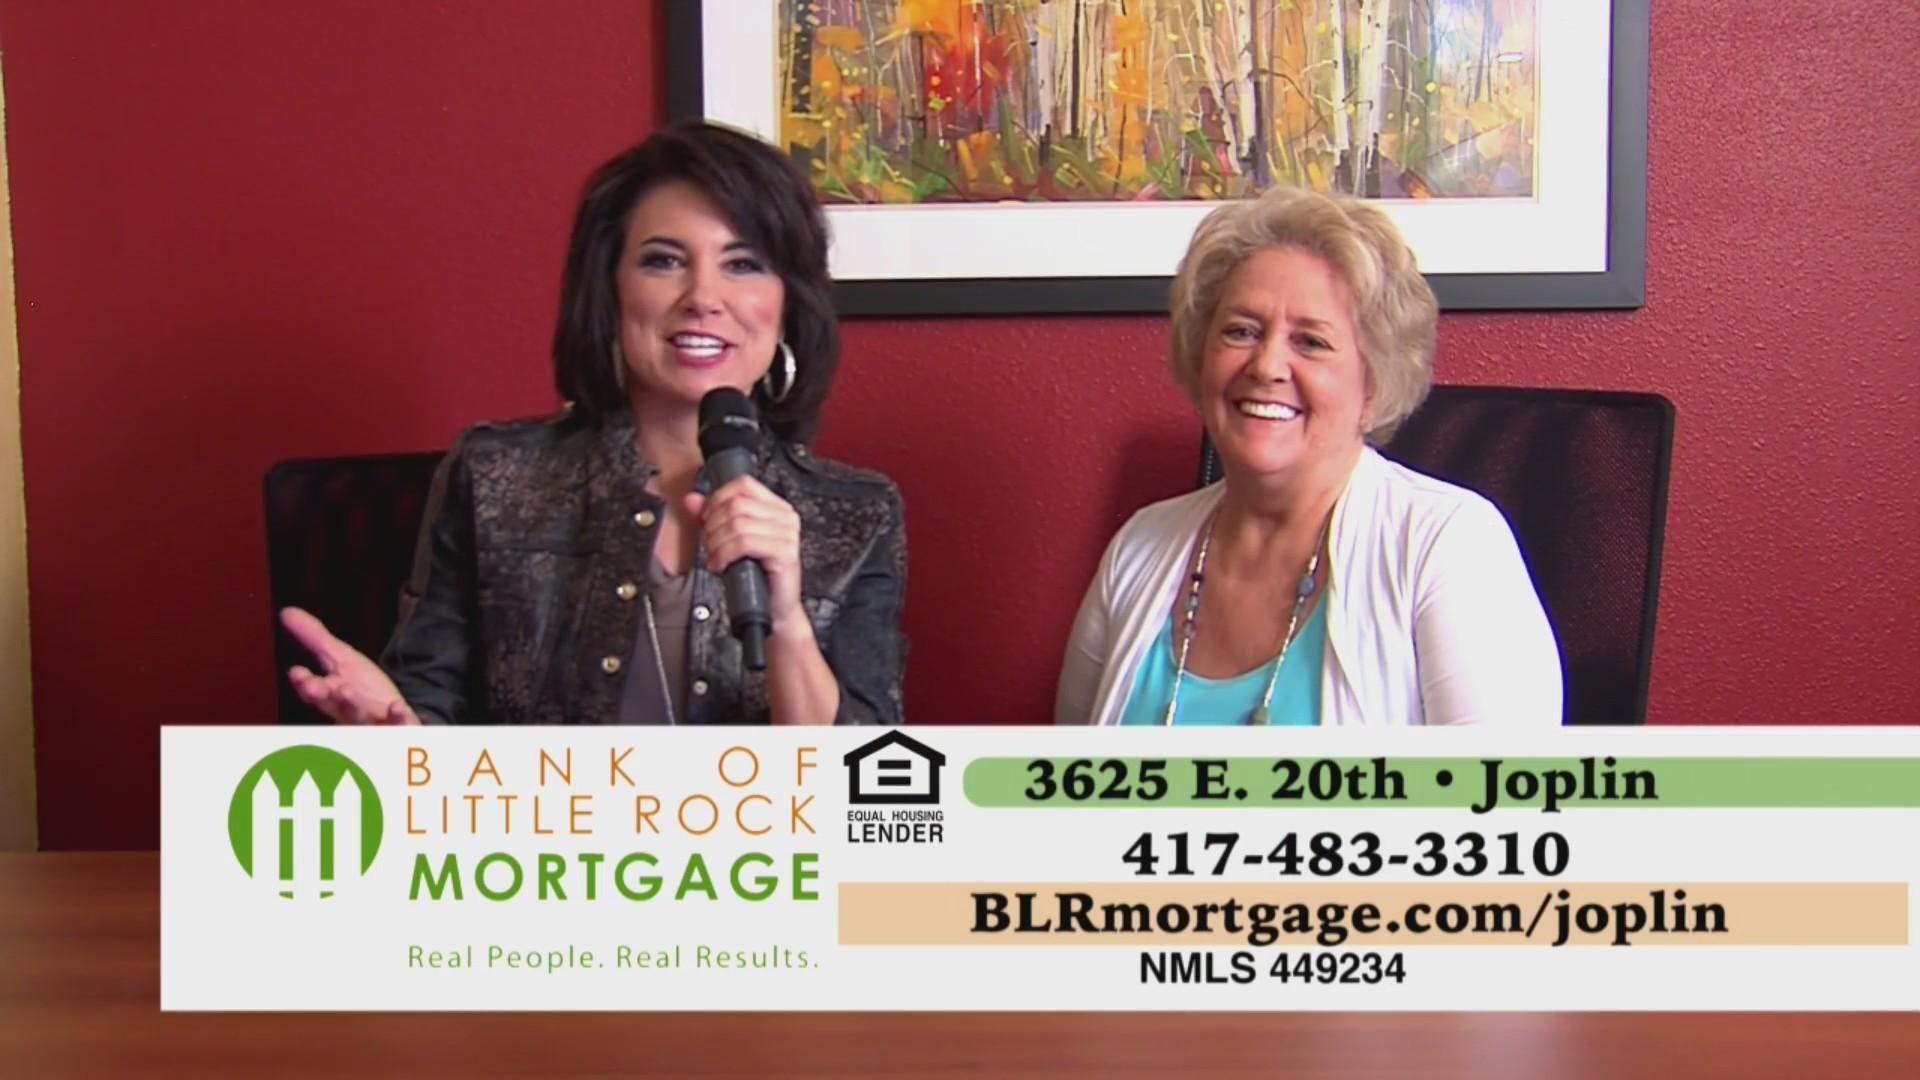 Bank of Little Rock Mortgage - April 2018 (040319)